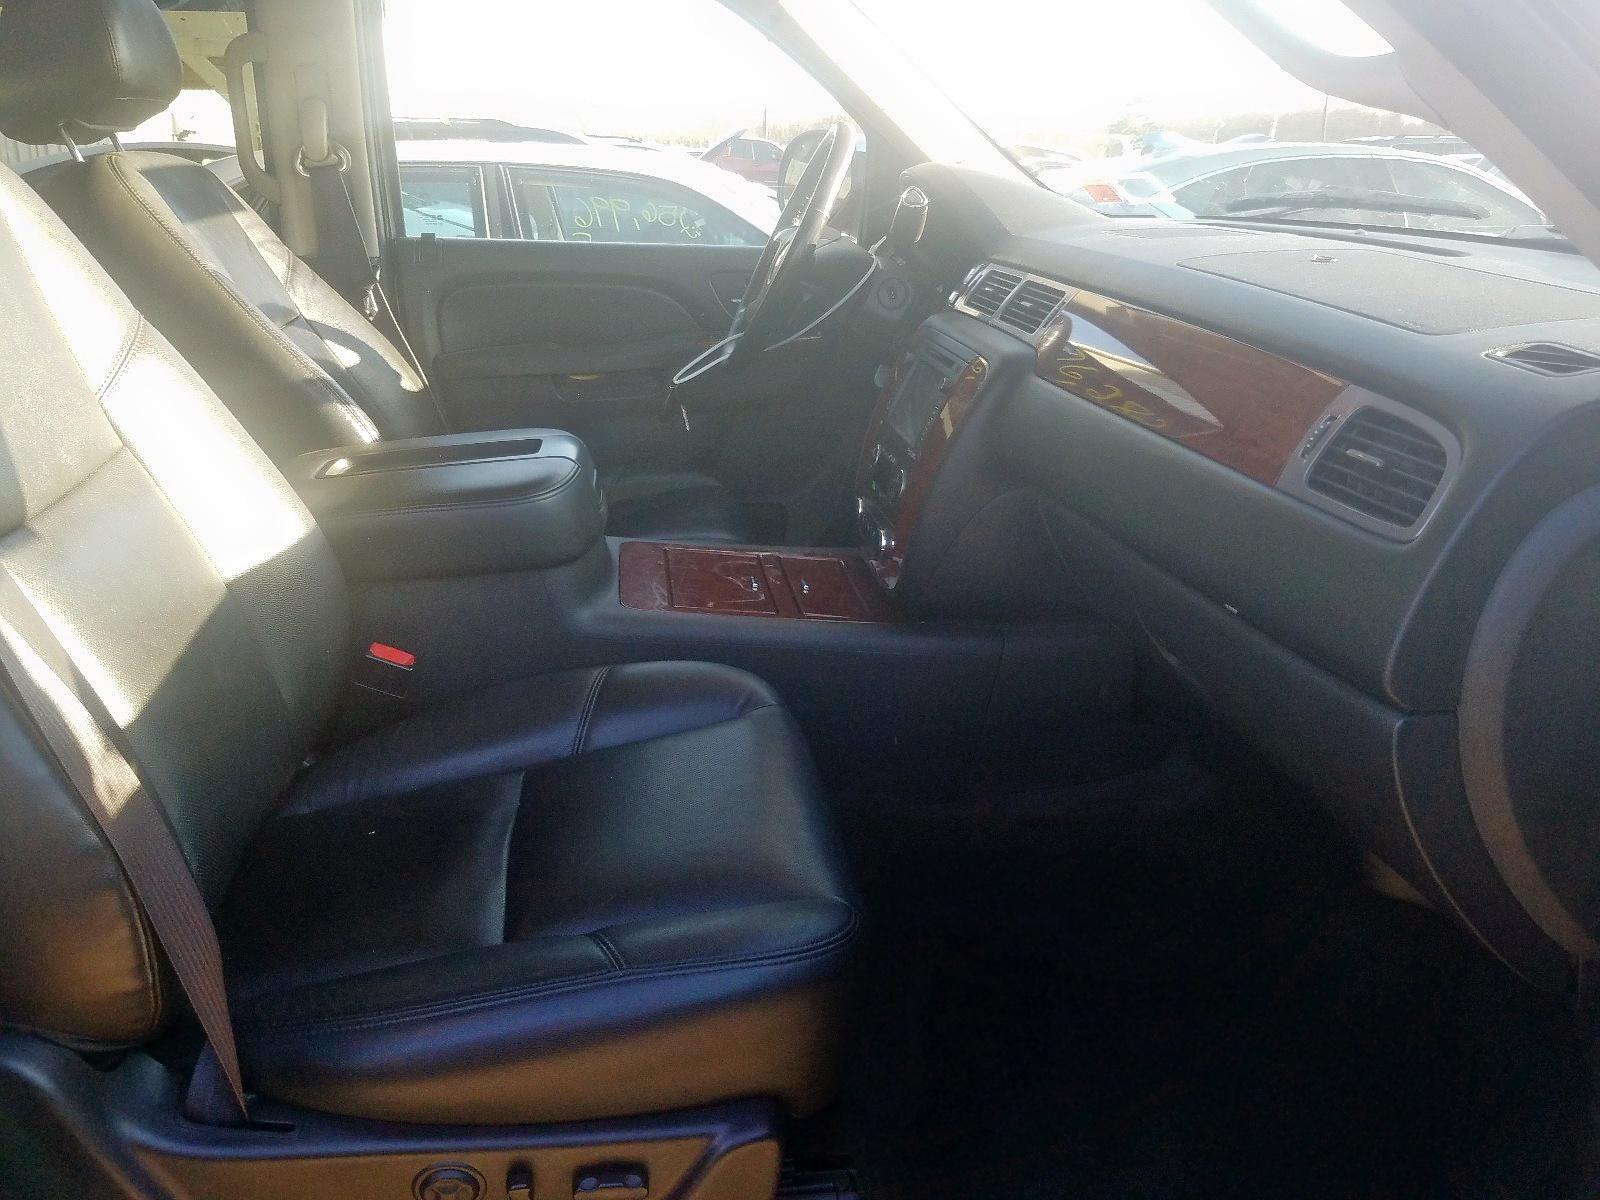 2012 Chevrolet Suburban K 5.3L close up View